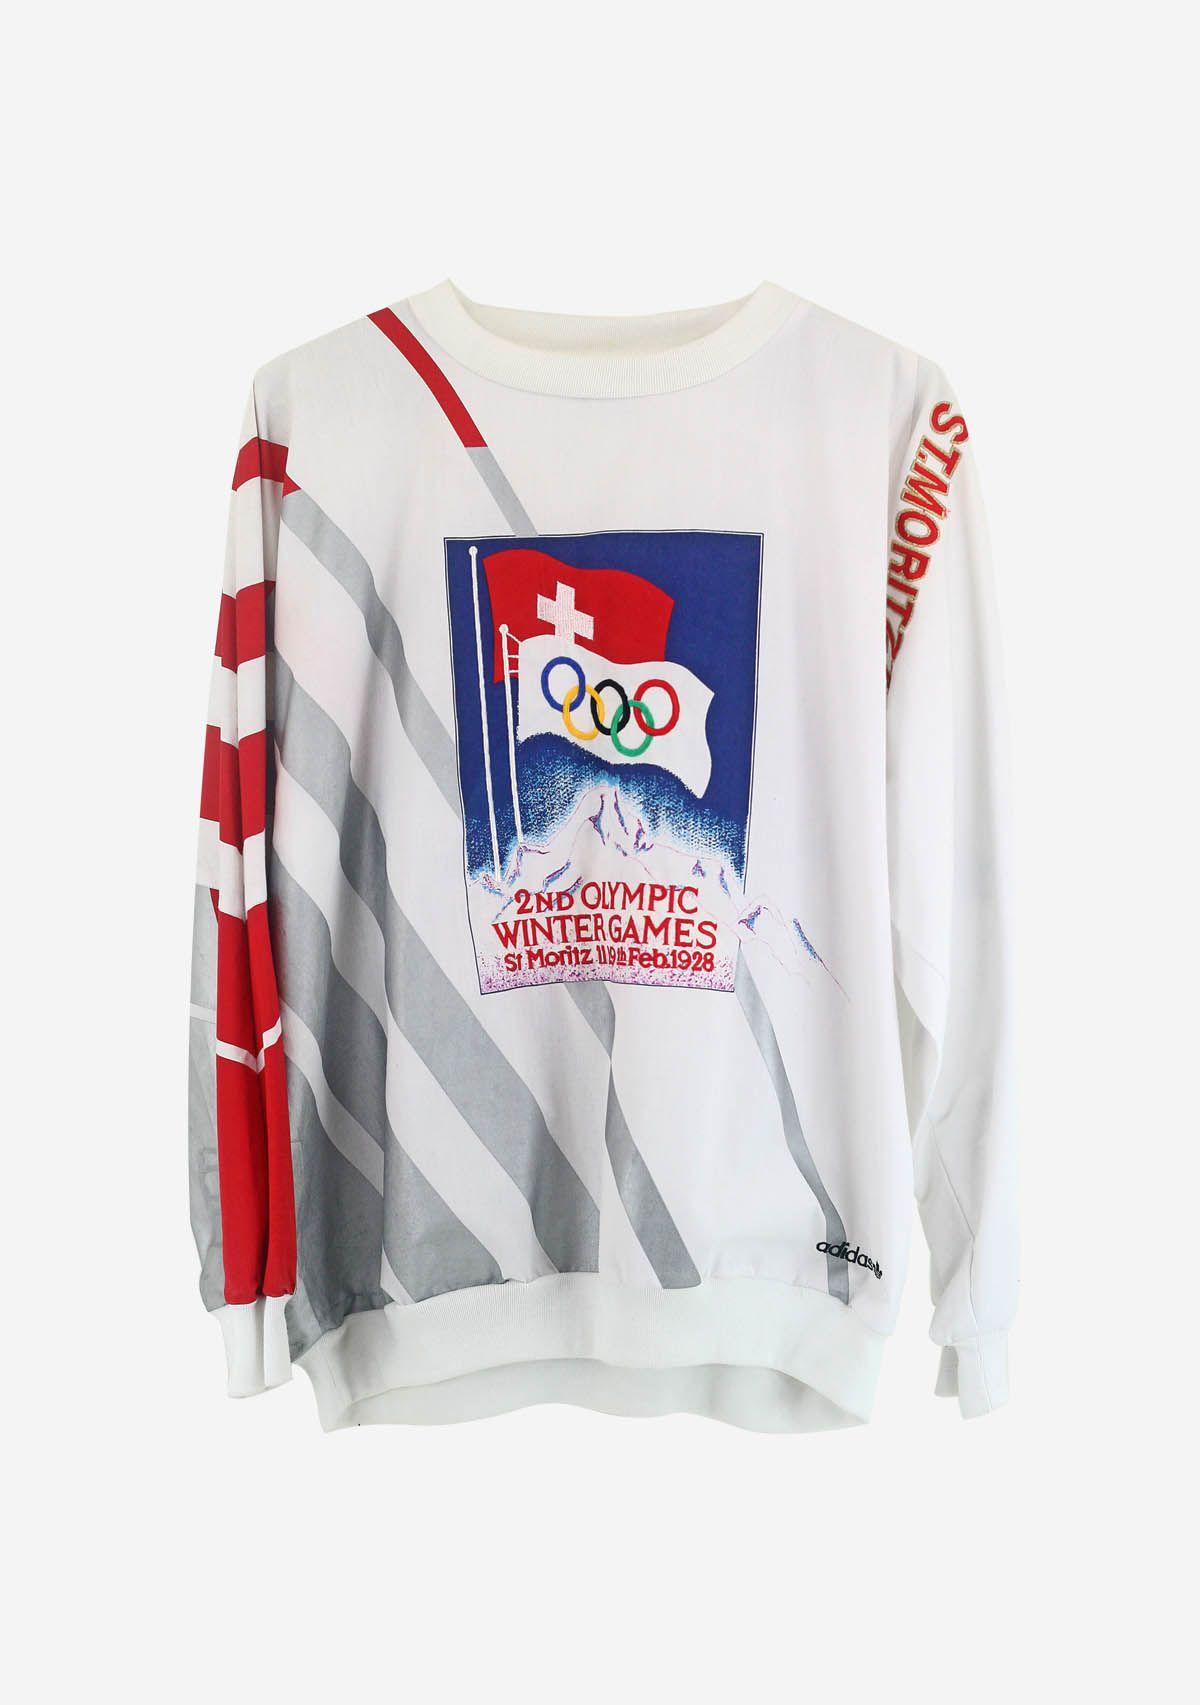 rare 80's vintage adidas sweatshirt olympic winter games